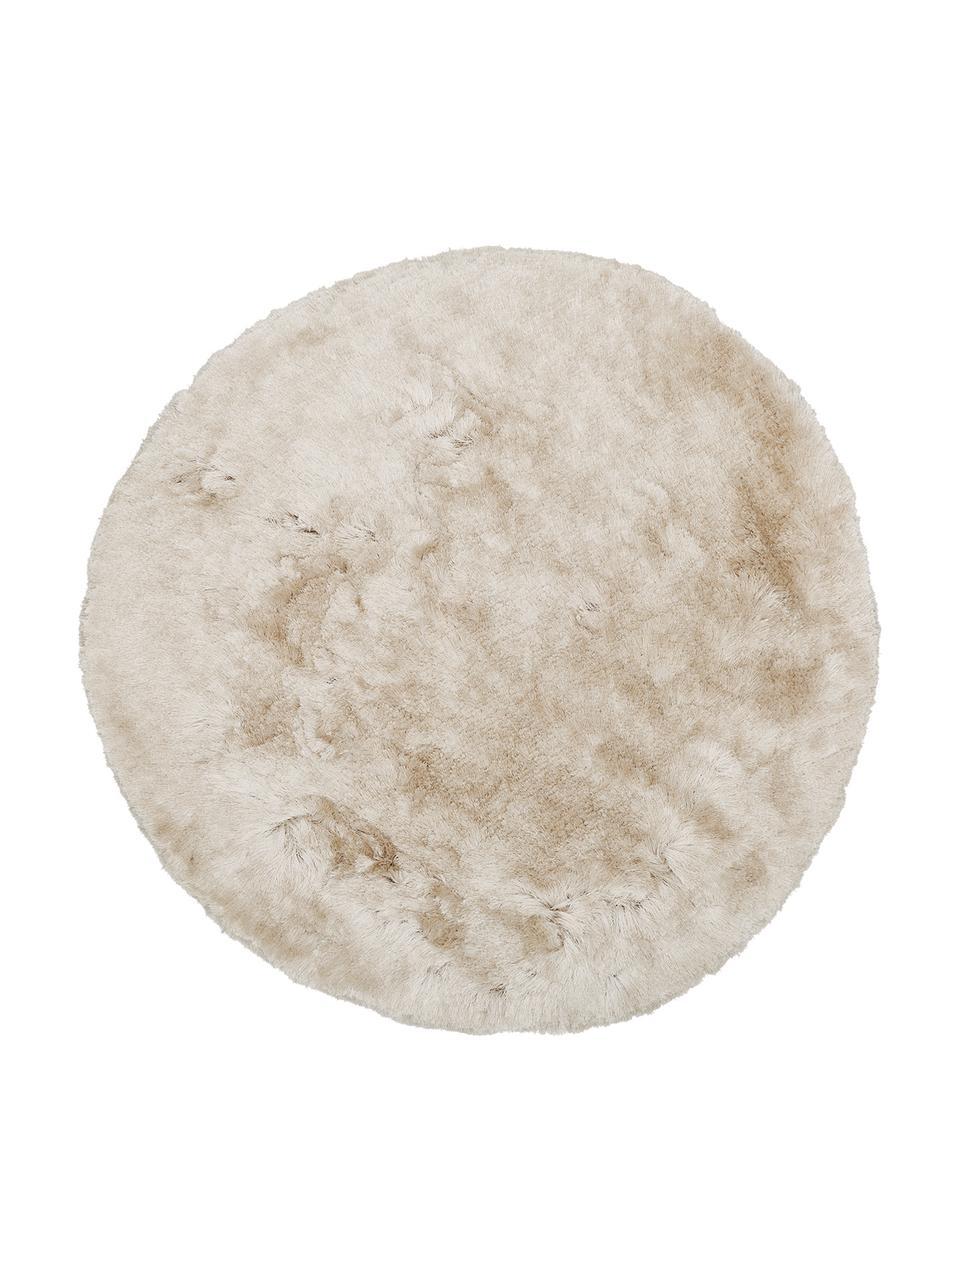 Tappeto rotondo lucido a pelo lungo color avorio Jimmy, Vello: 100% poliestere, Retro: 100% cotone, Avorio, Ø 200 x Alt. 6,5 cm